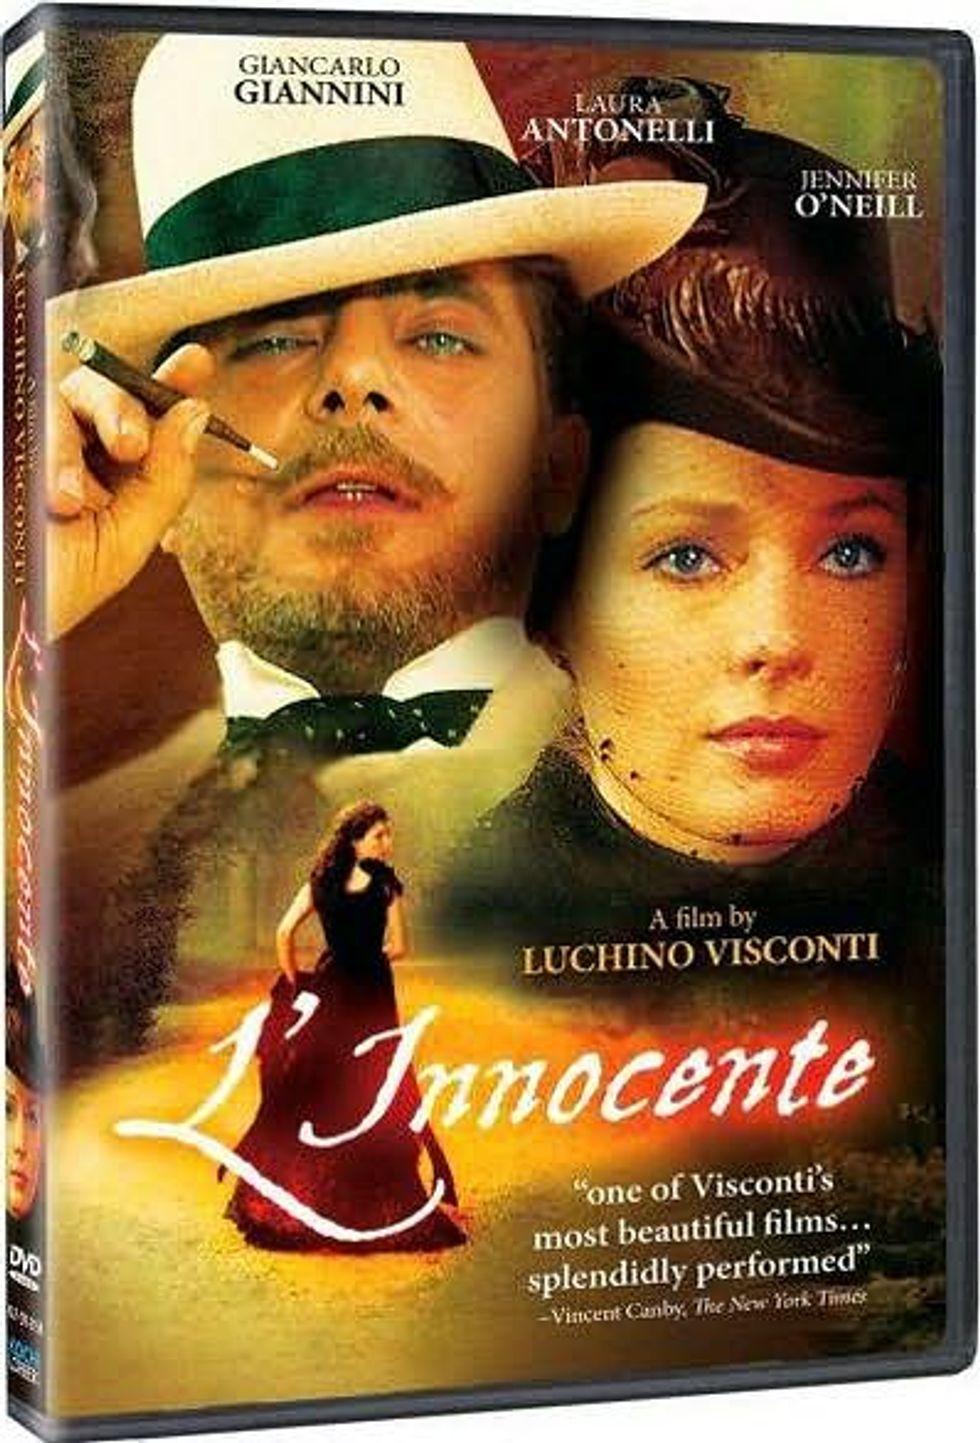 Luchino Visconti's L'Innocente On DVD!